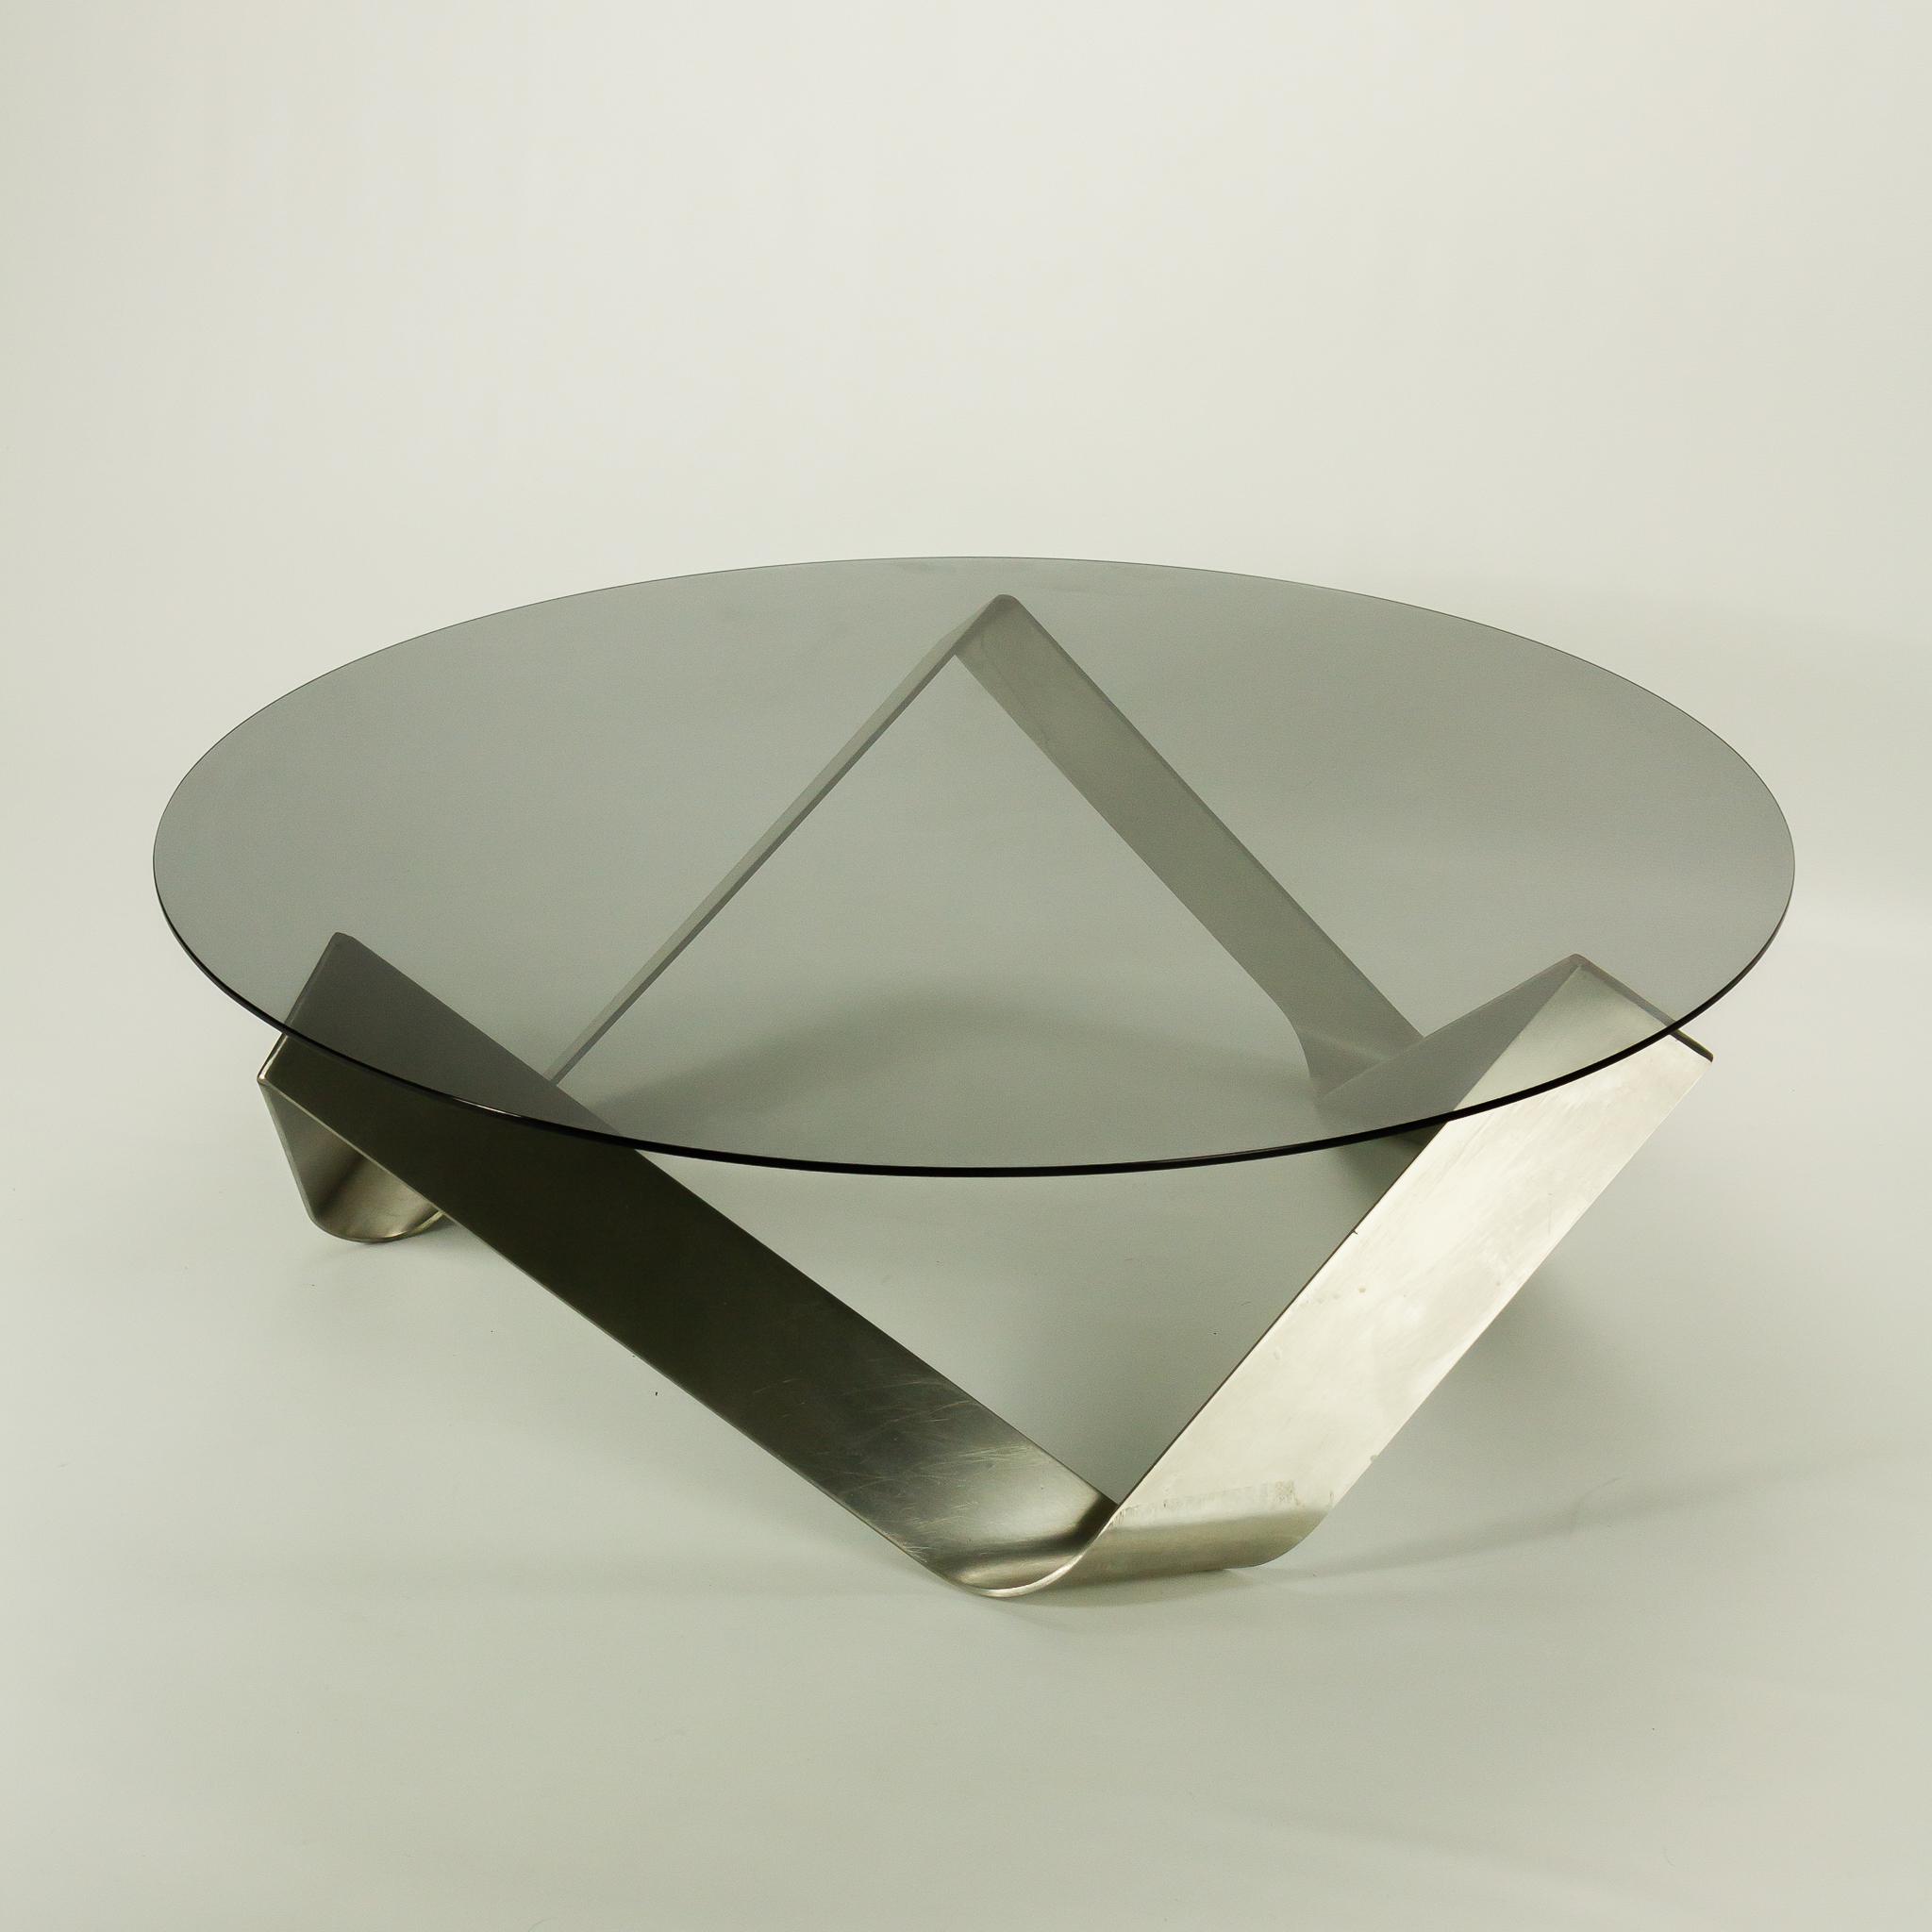 Design Bijzettafel Chroomglas.60 S Ronald Schmitt Stijl Salontafel Rvs Glas Barbmama